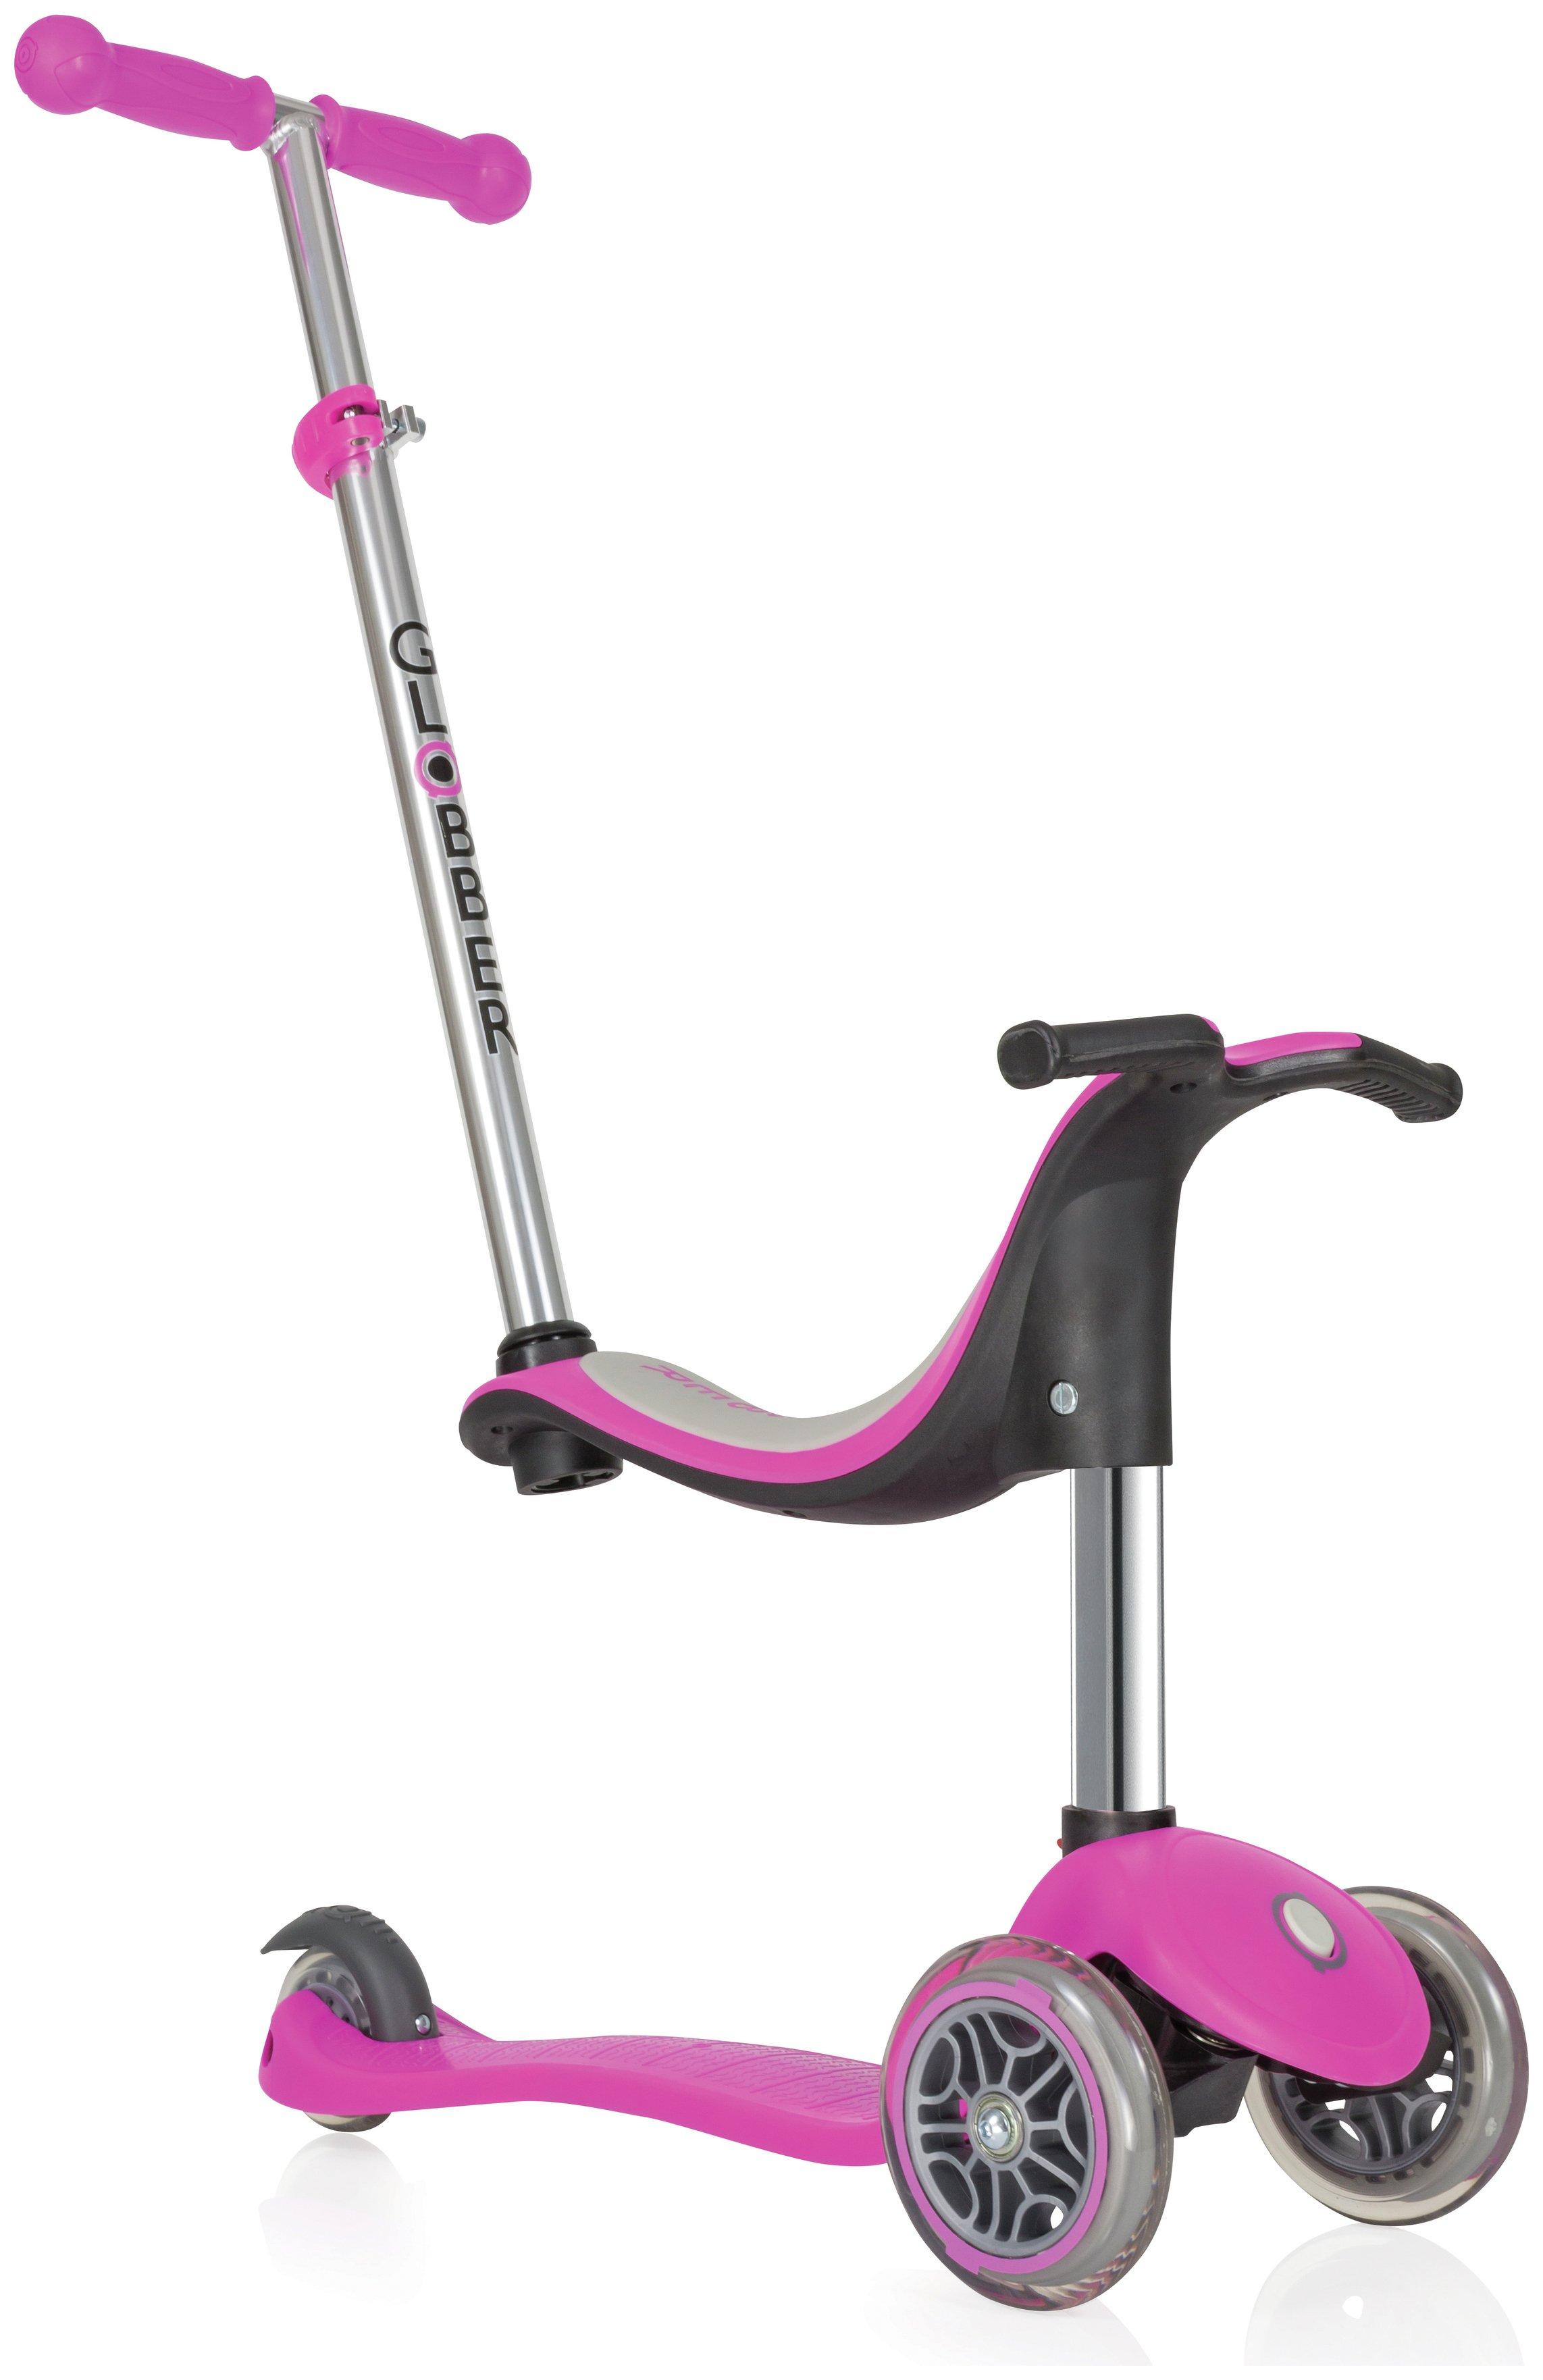 Buy Globber Evo 4 In 1 3 Wheel Scooter Deep Pink Scooters Argos